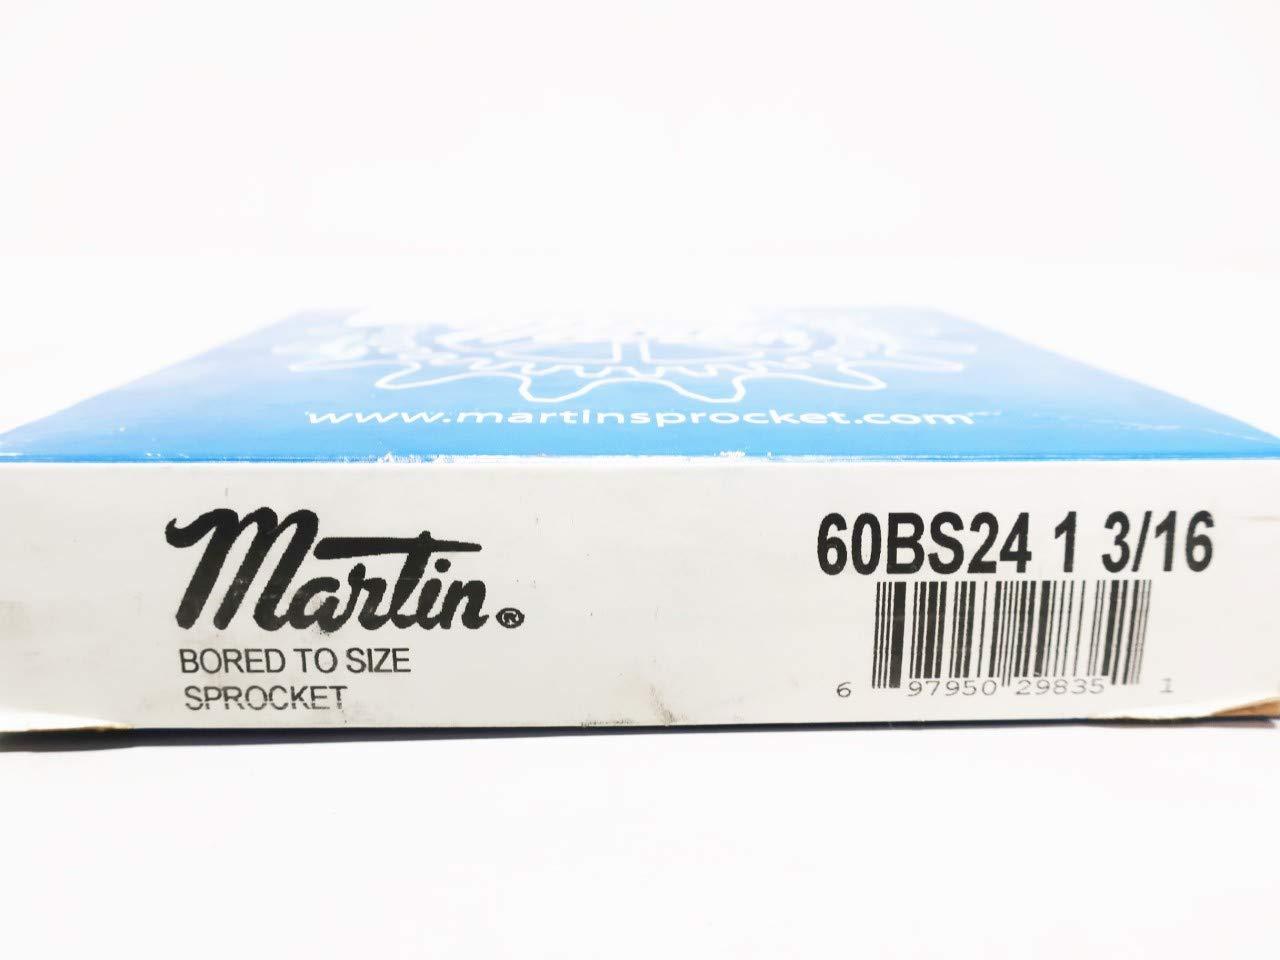 MARTIN 60BS24 1 3//16 1-3//16IN 24T 3//4IN Single Roller Chain Sprocket